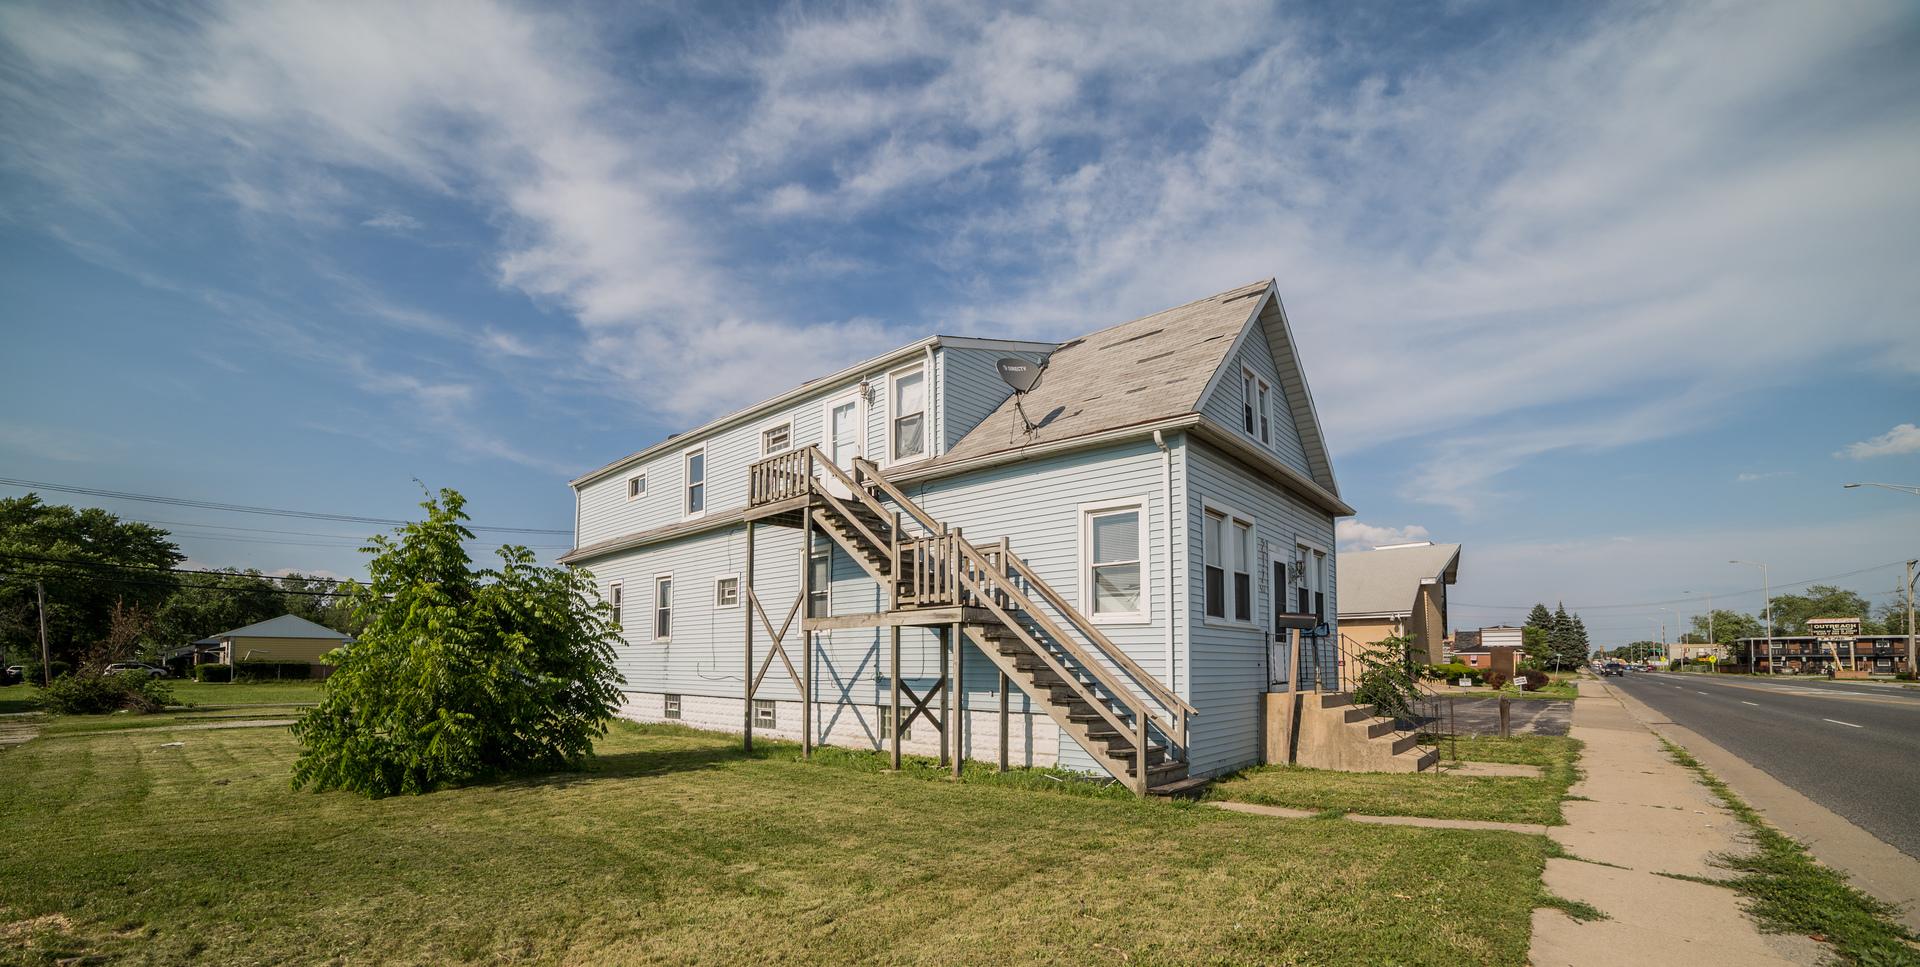 217 West 147th, Dixmoor, Illinois, 60426